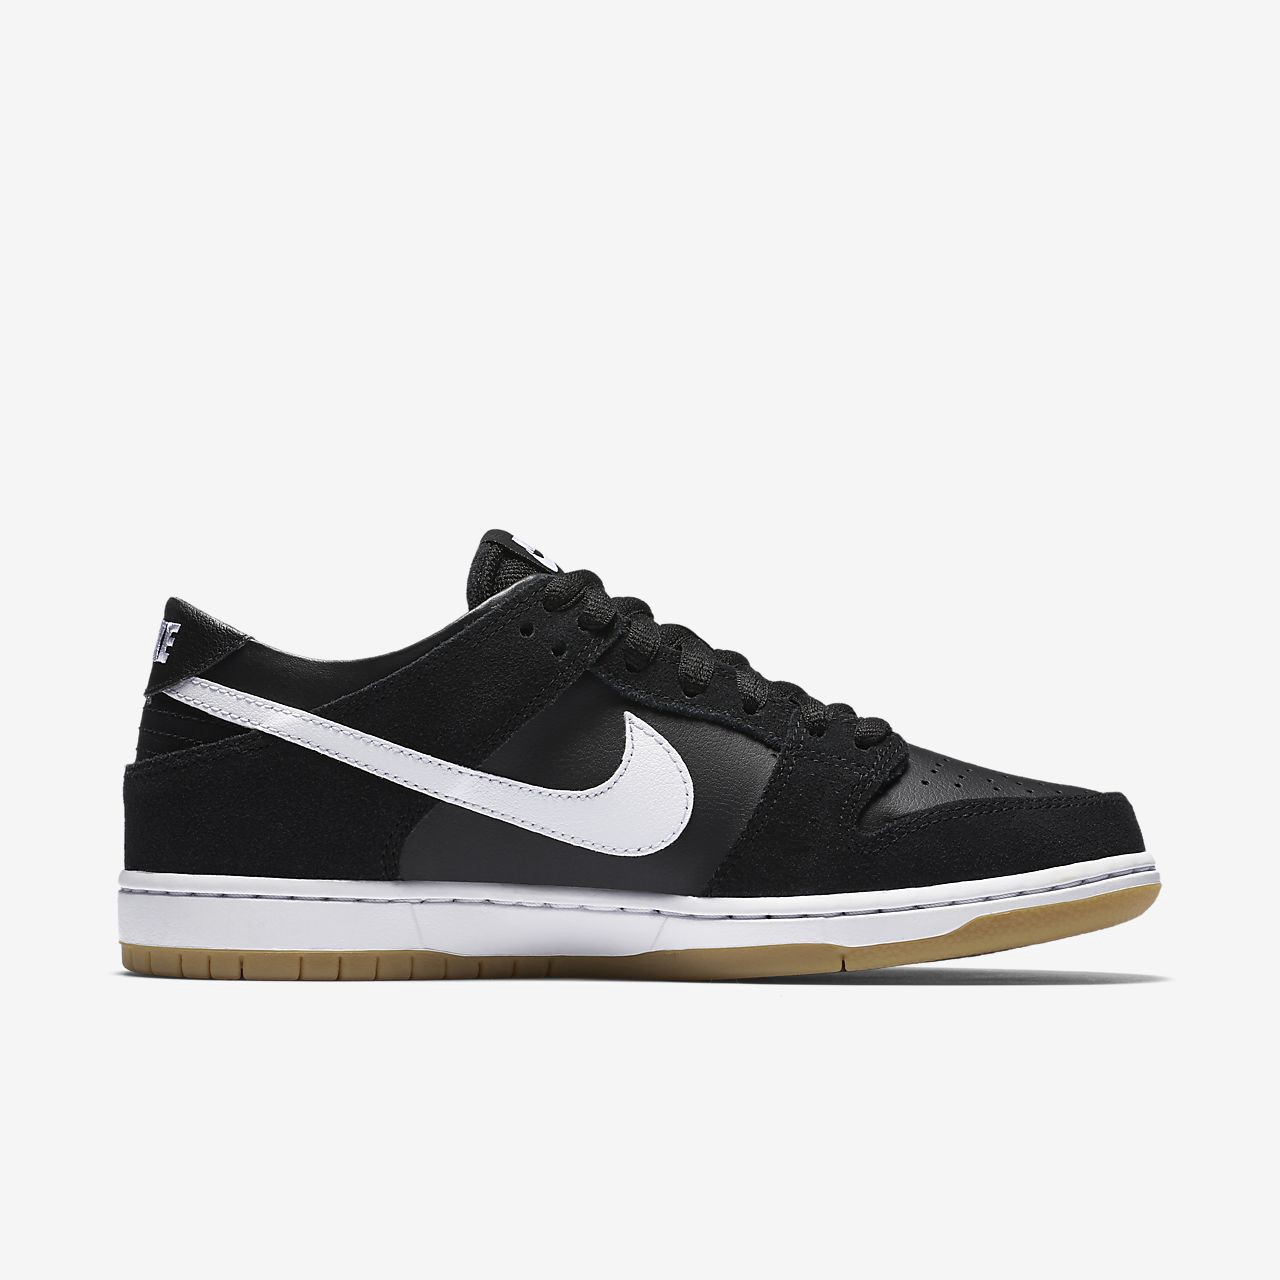 outlet store 65b97 1c7e3 Nike Sb Dunk Low Pro Men s Skateboarding Shoe - 11.5 Zapatillas De Skate, Nike  Sb